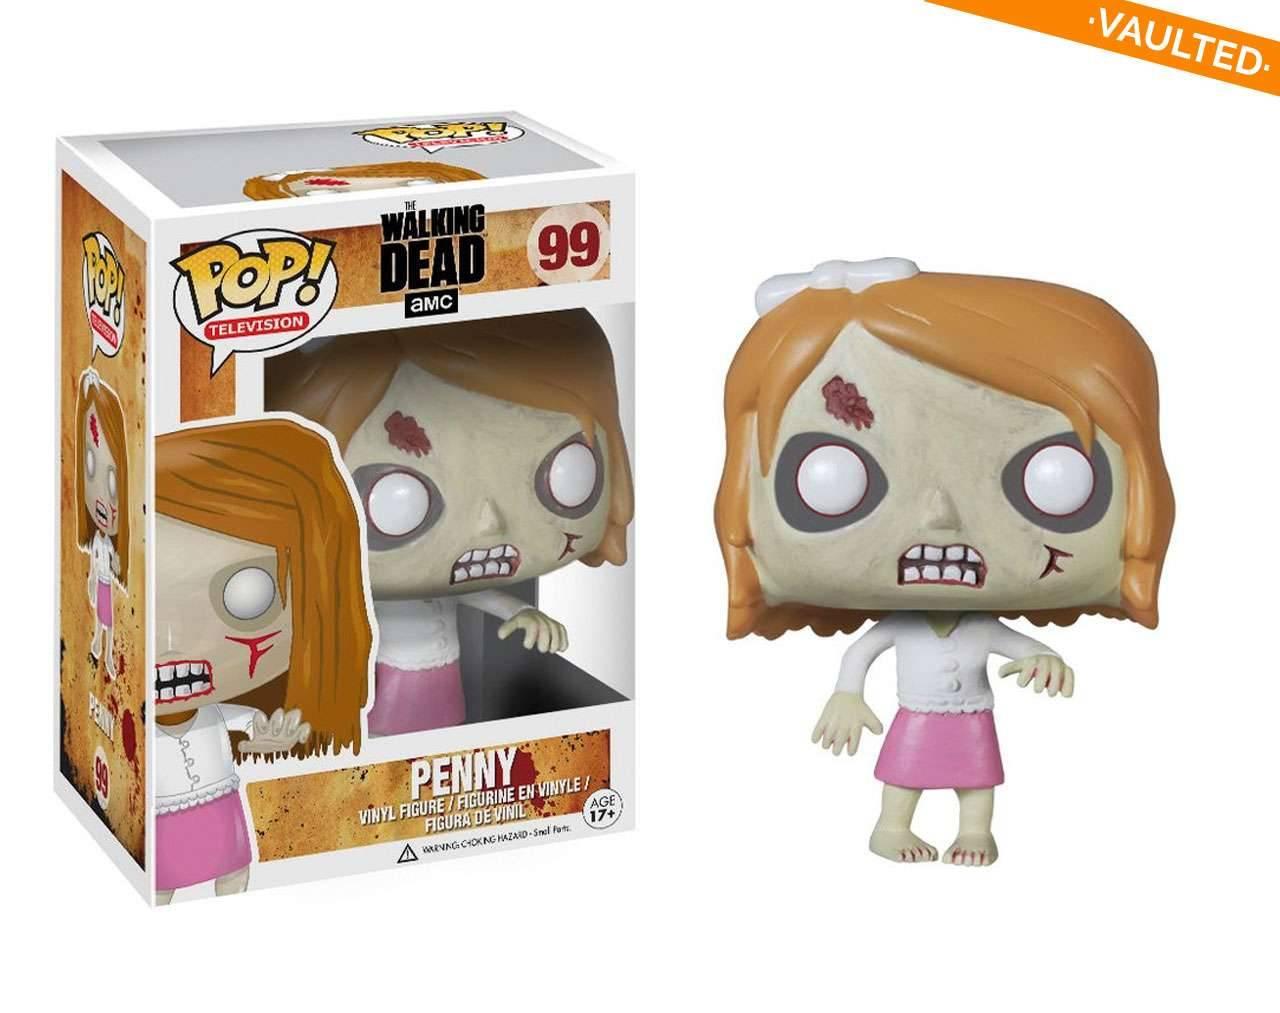 Penny Zombie (Vaulted) Pop! Vinyl